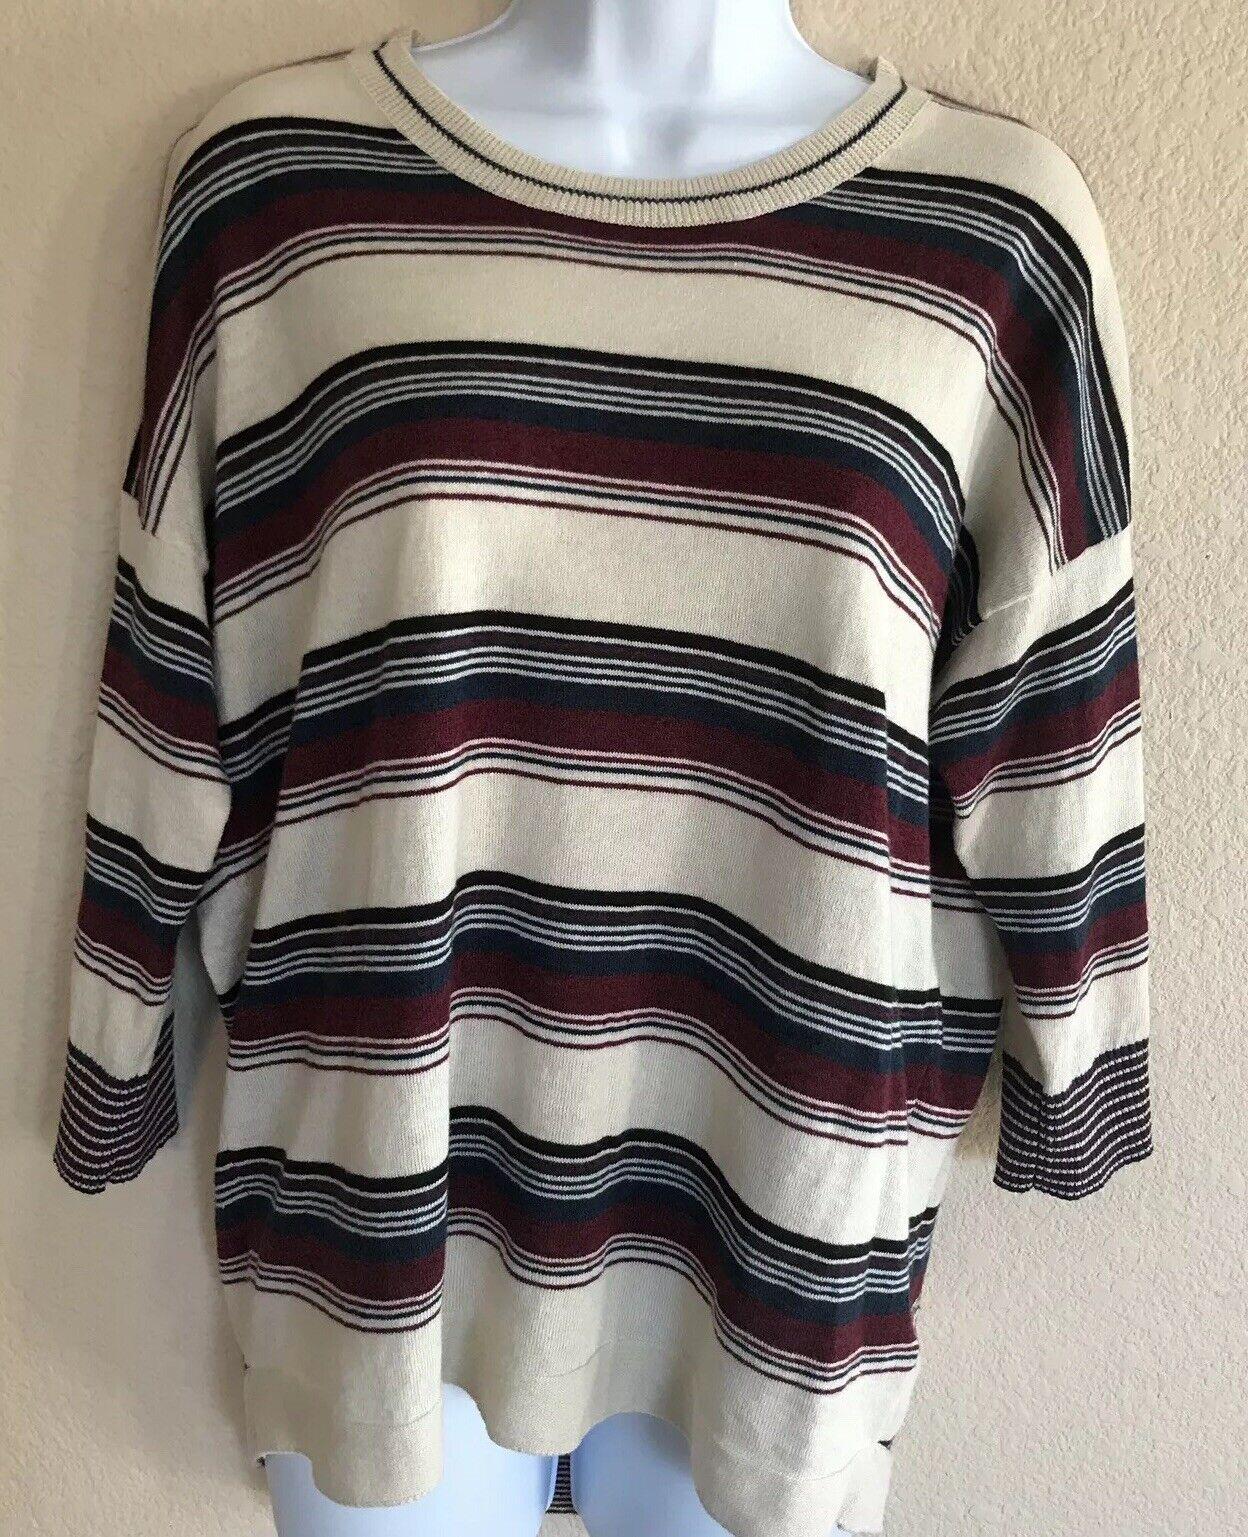 White Stuff Women'sSize US 6 Striped Knit Top